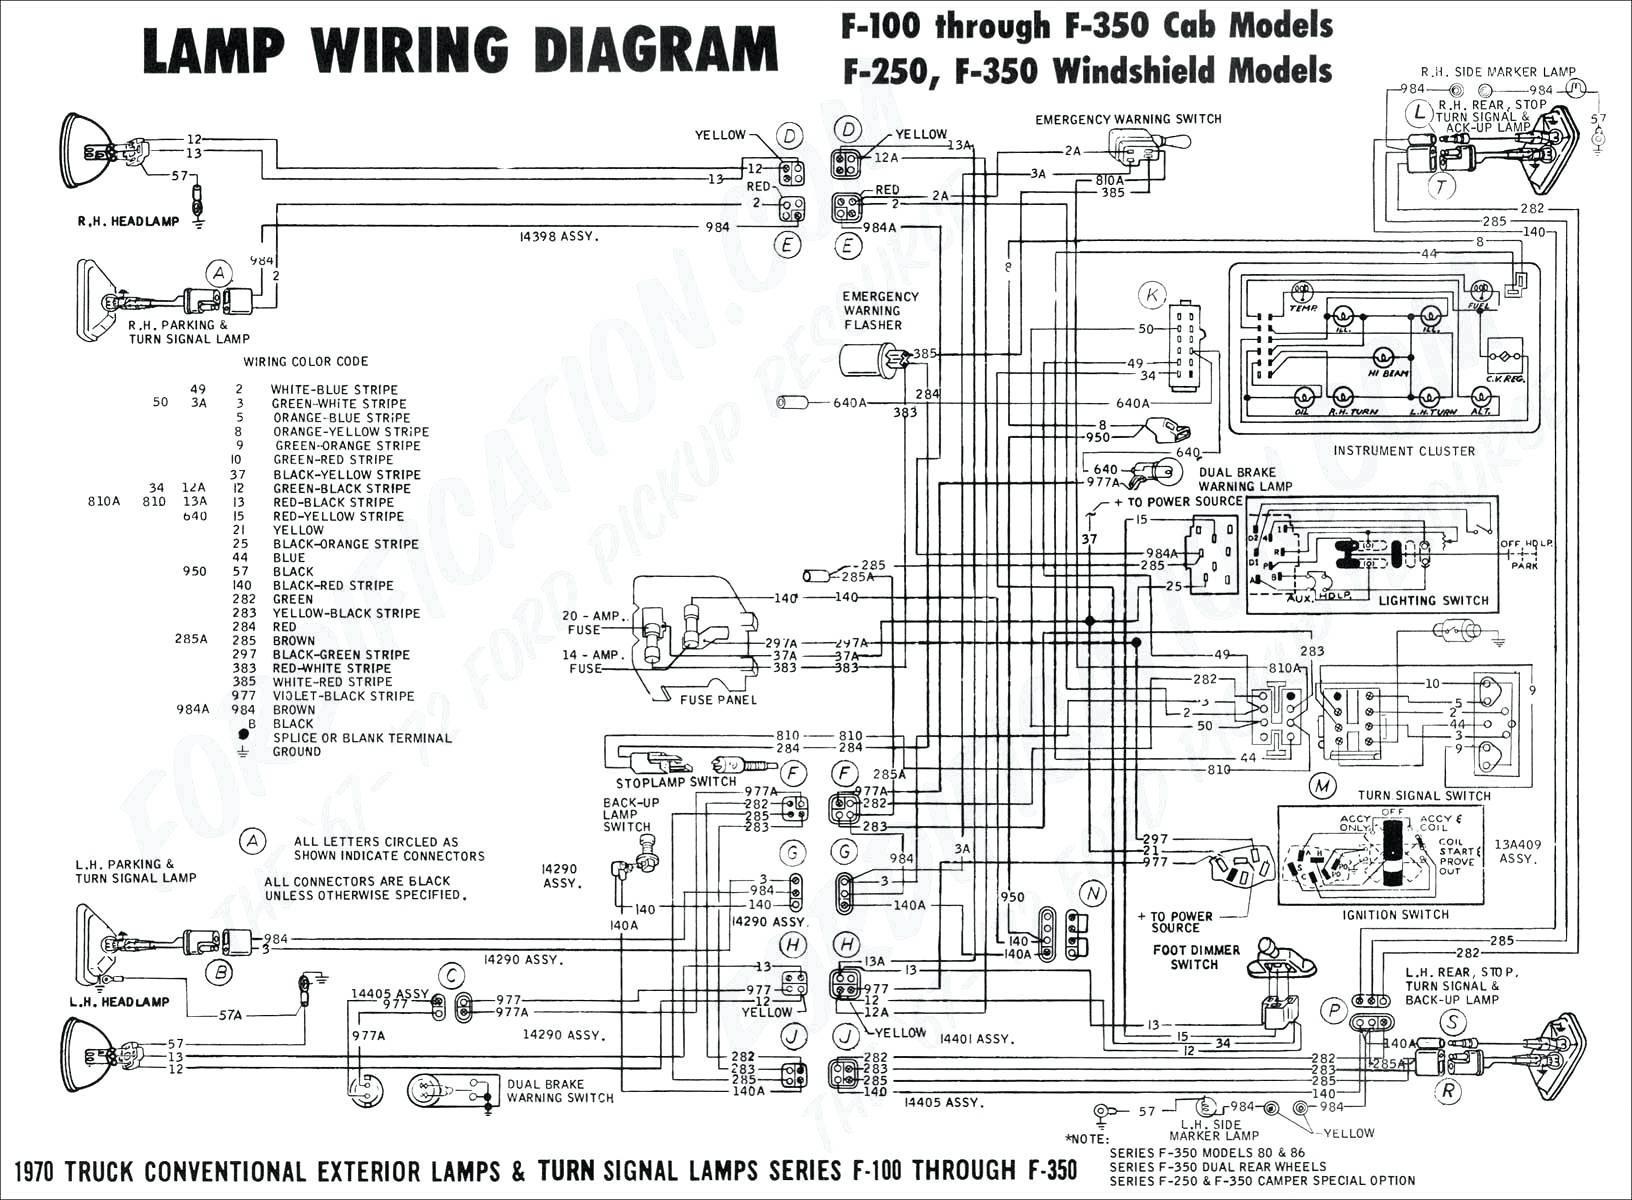 House Wiring Diagram Pdf 2005 ford F 150 Wiring Diagram Wiring Diagram Data Of House Wiring Diagram Pdf